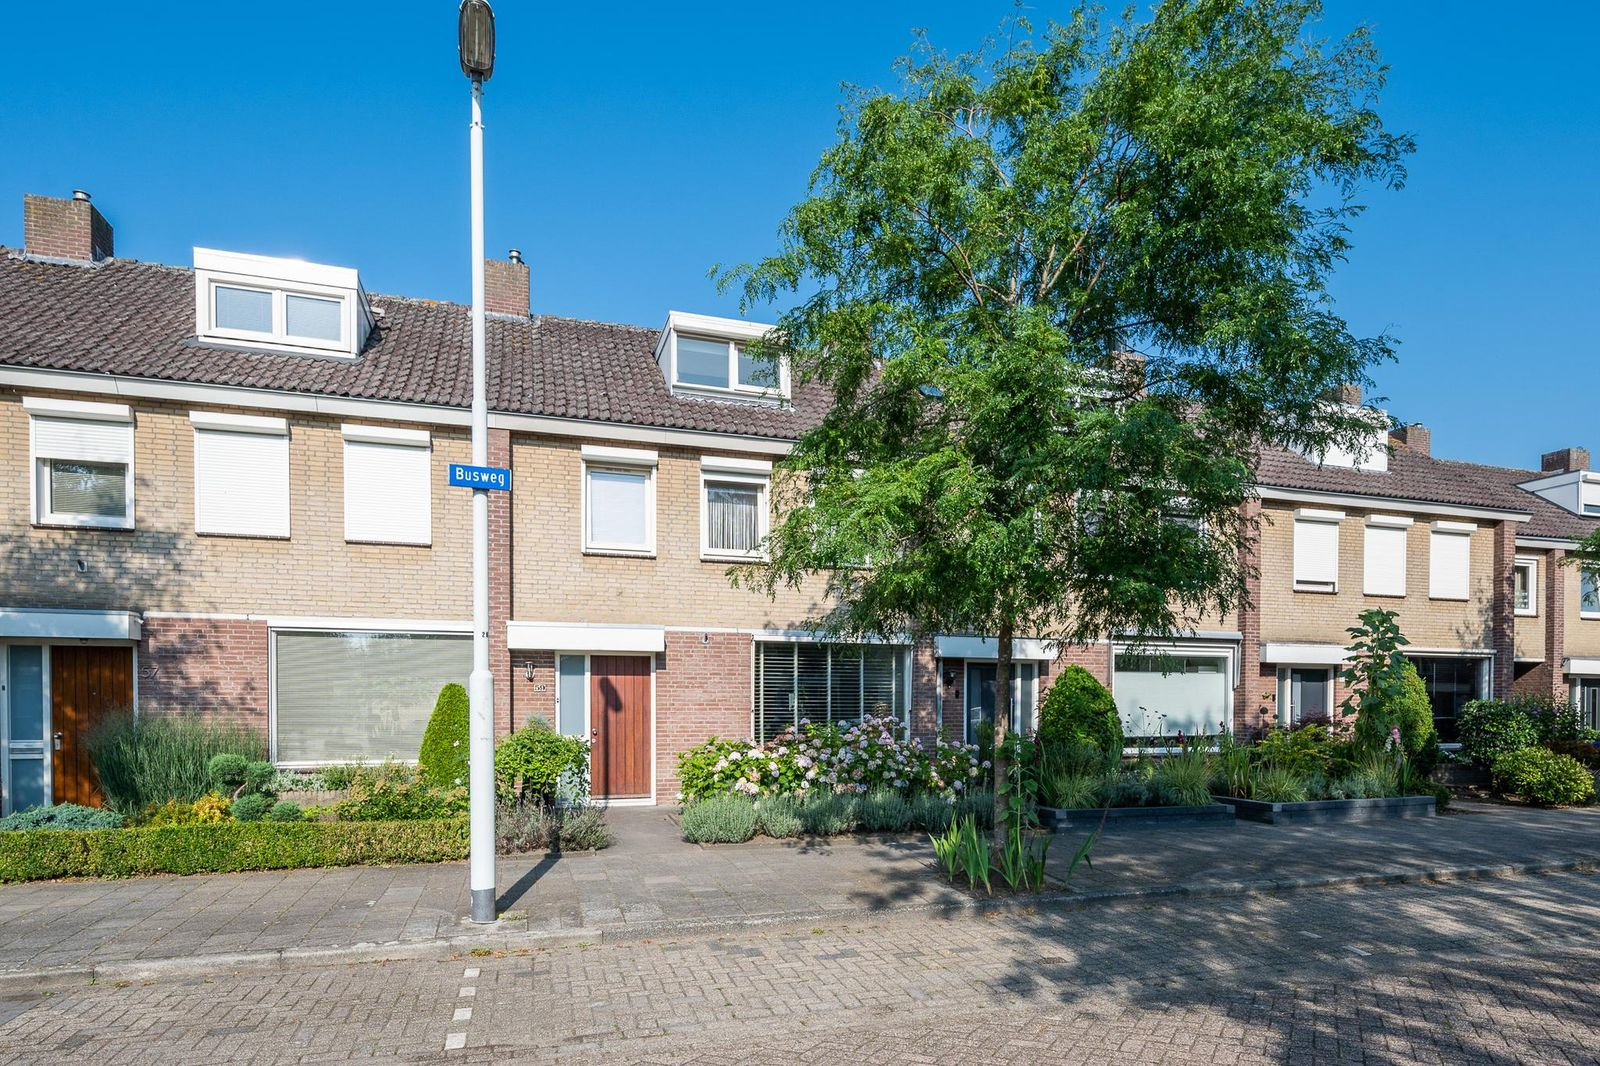 Busweg 59, Eindhoven